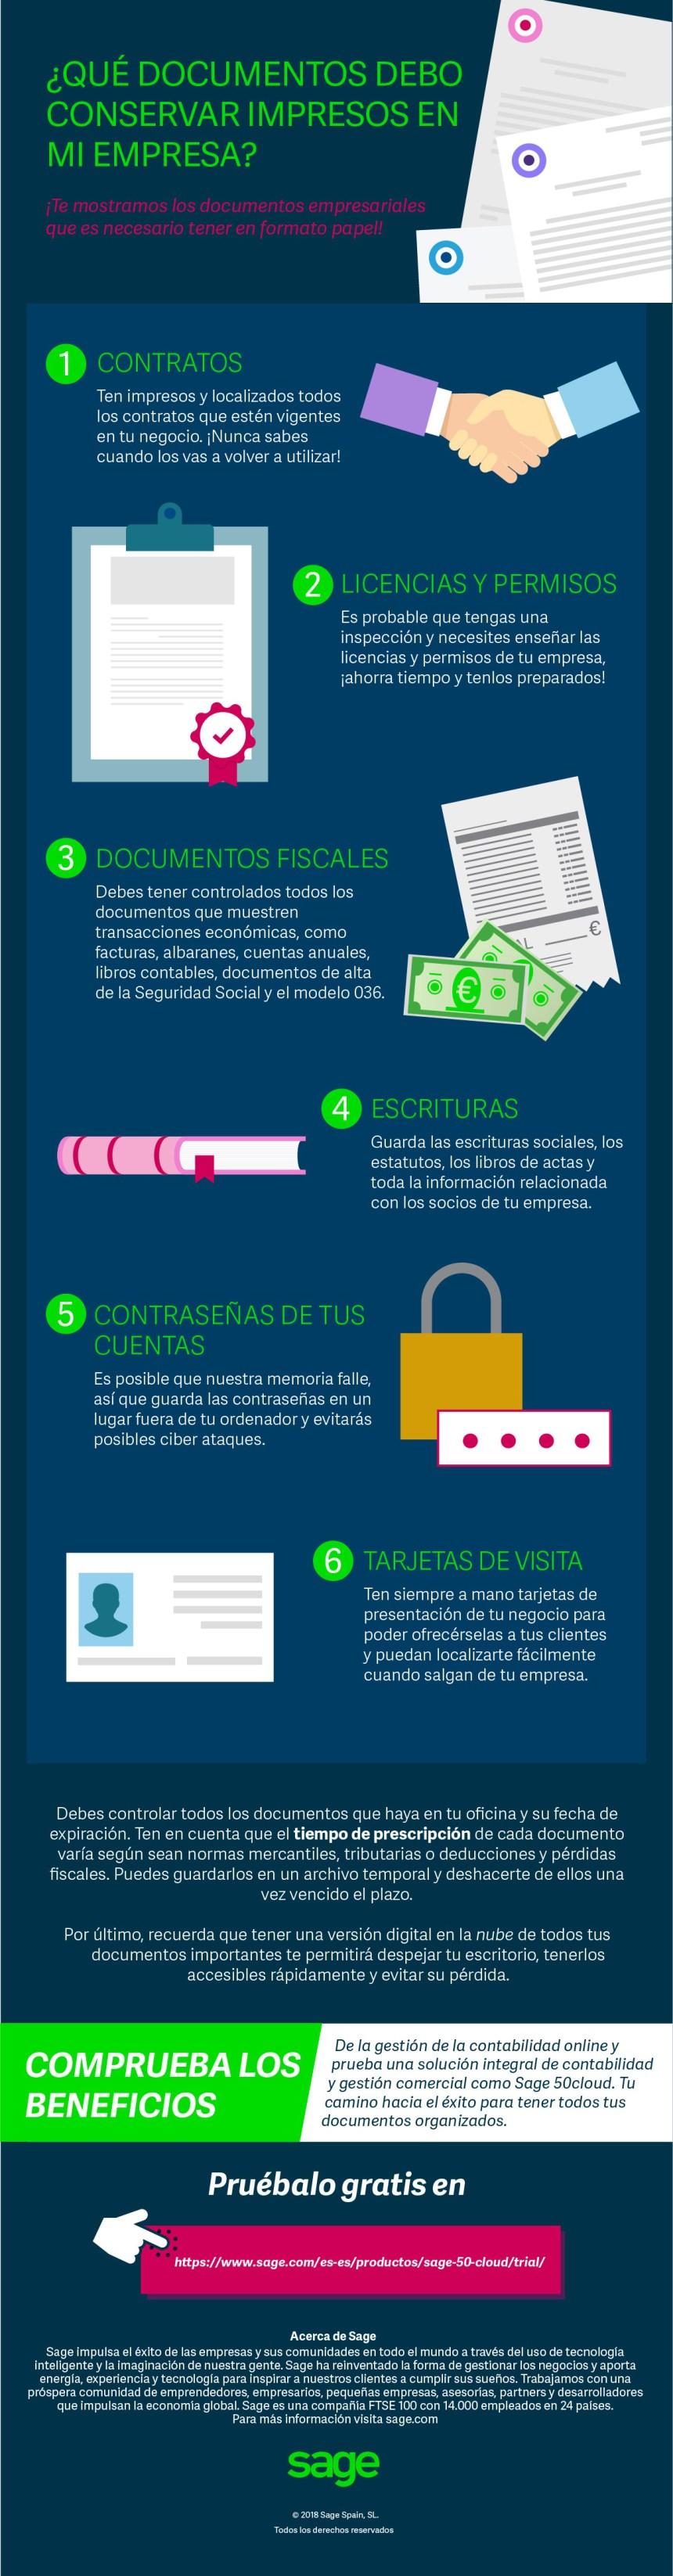 Qué documentos debo de conservar impresos en mi empresa #infografia #infographic